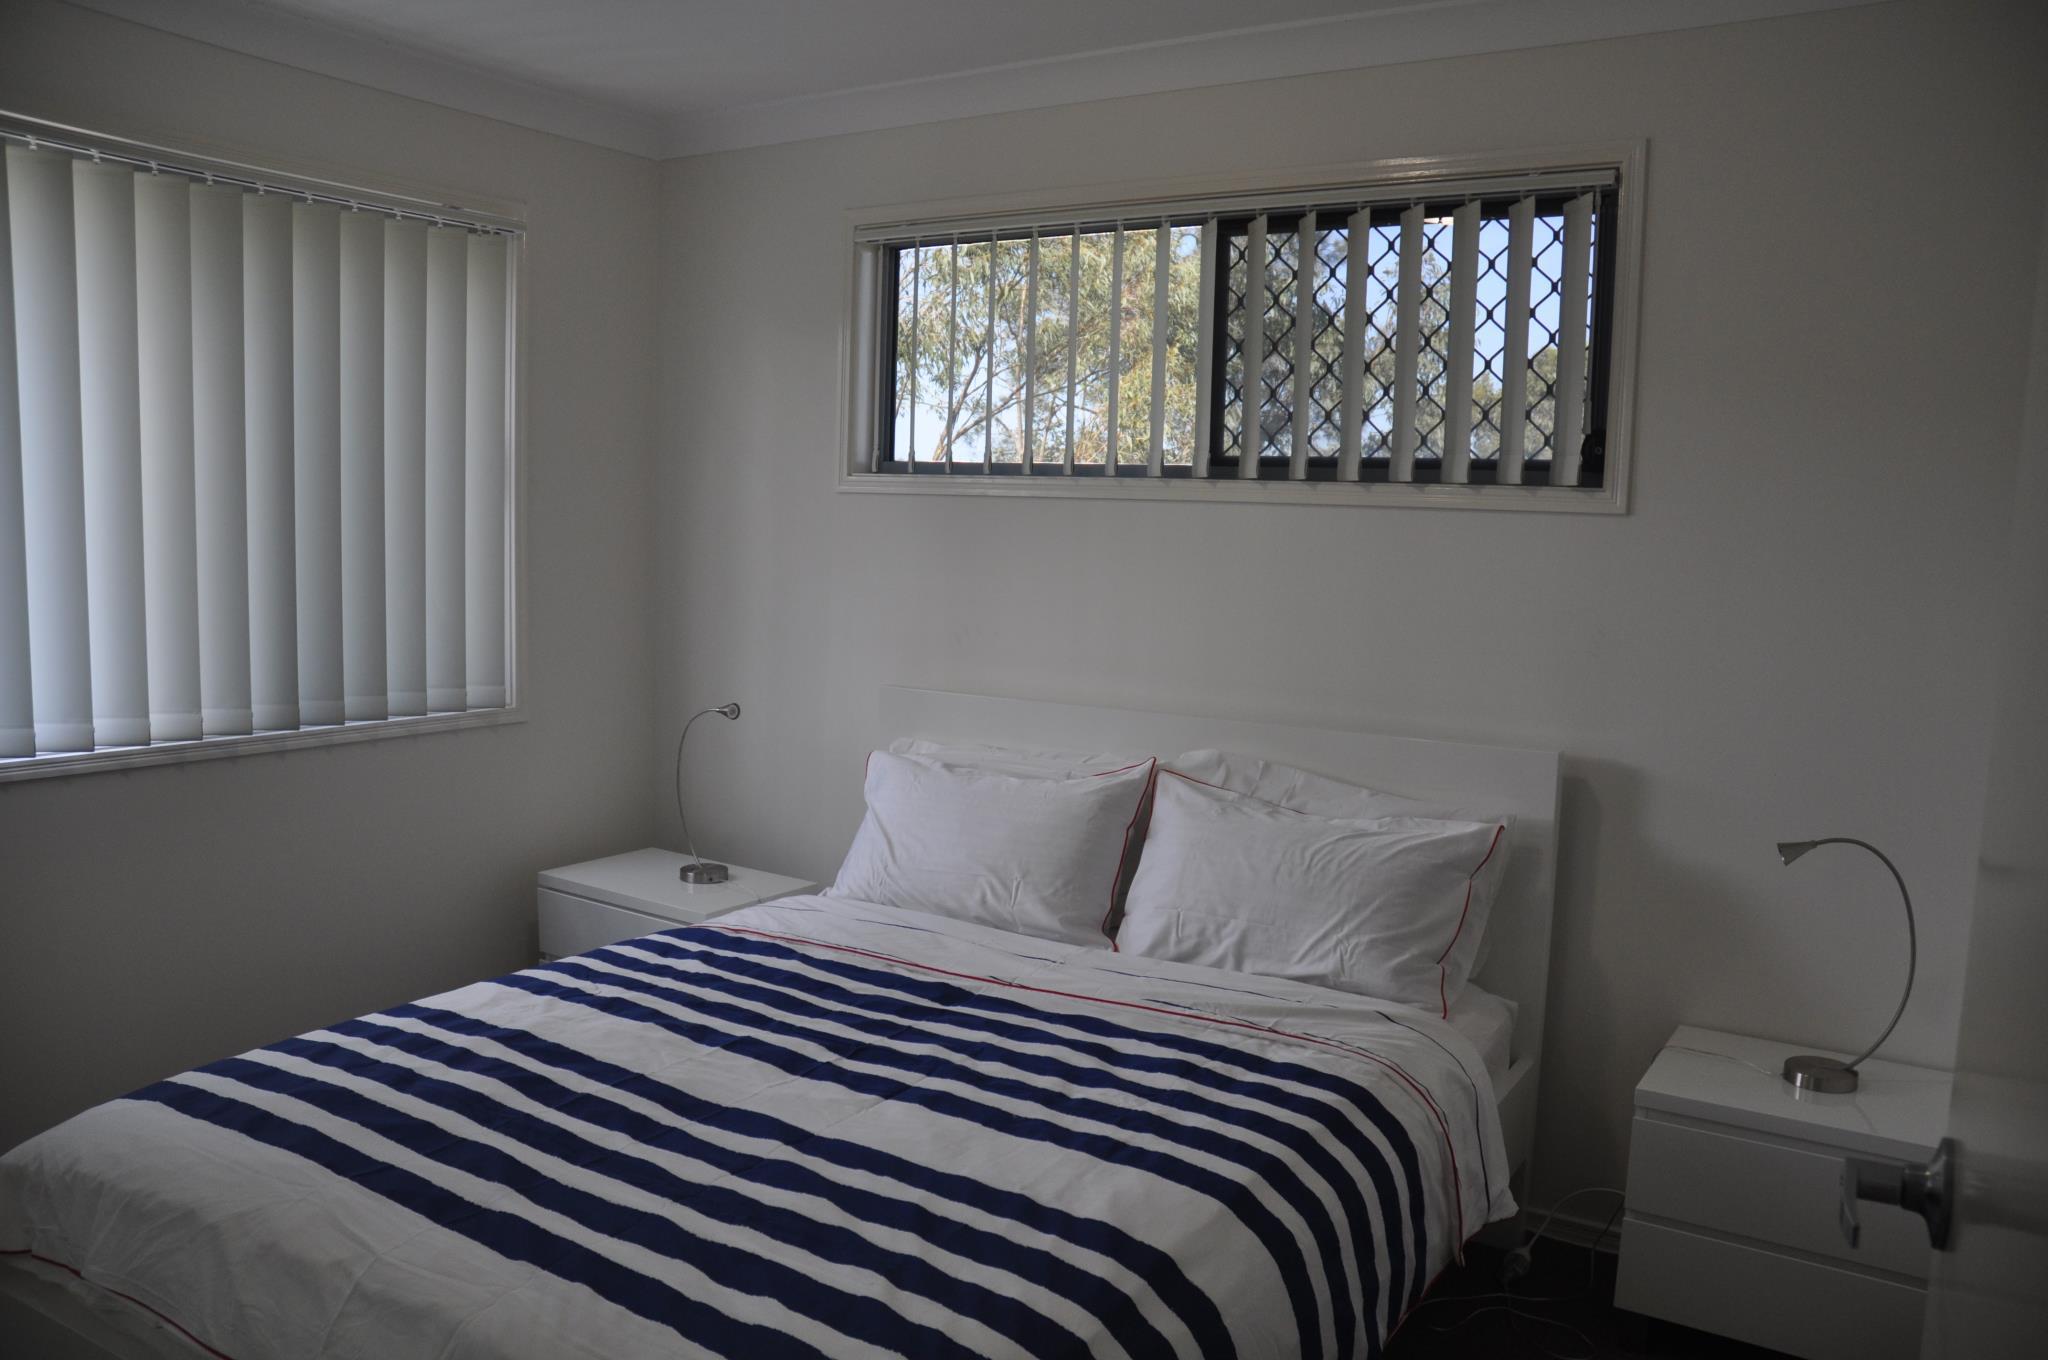 Luxury Between BrisandGC 3 Bedroom 2 Baths 4 Toilets